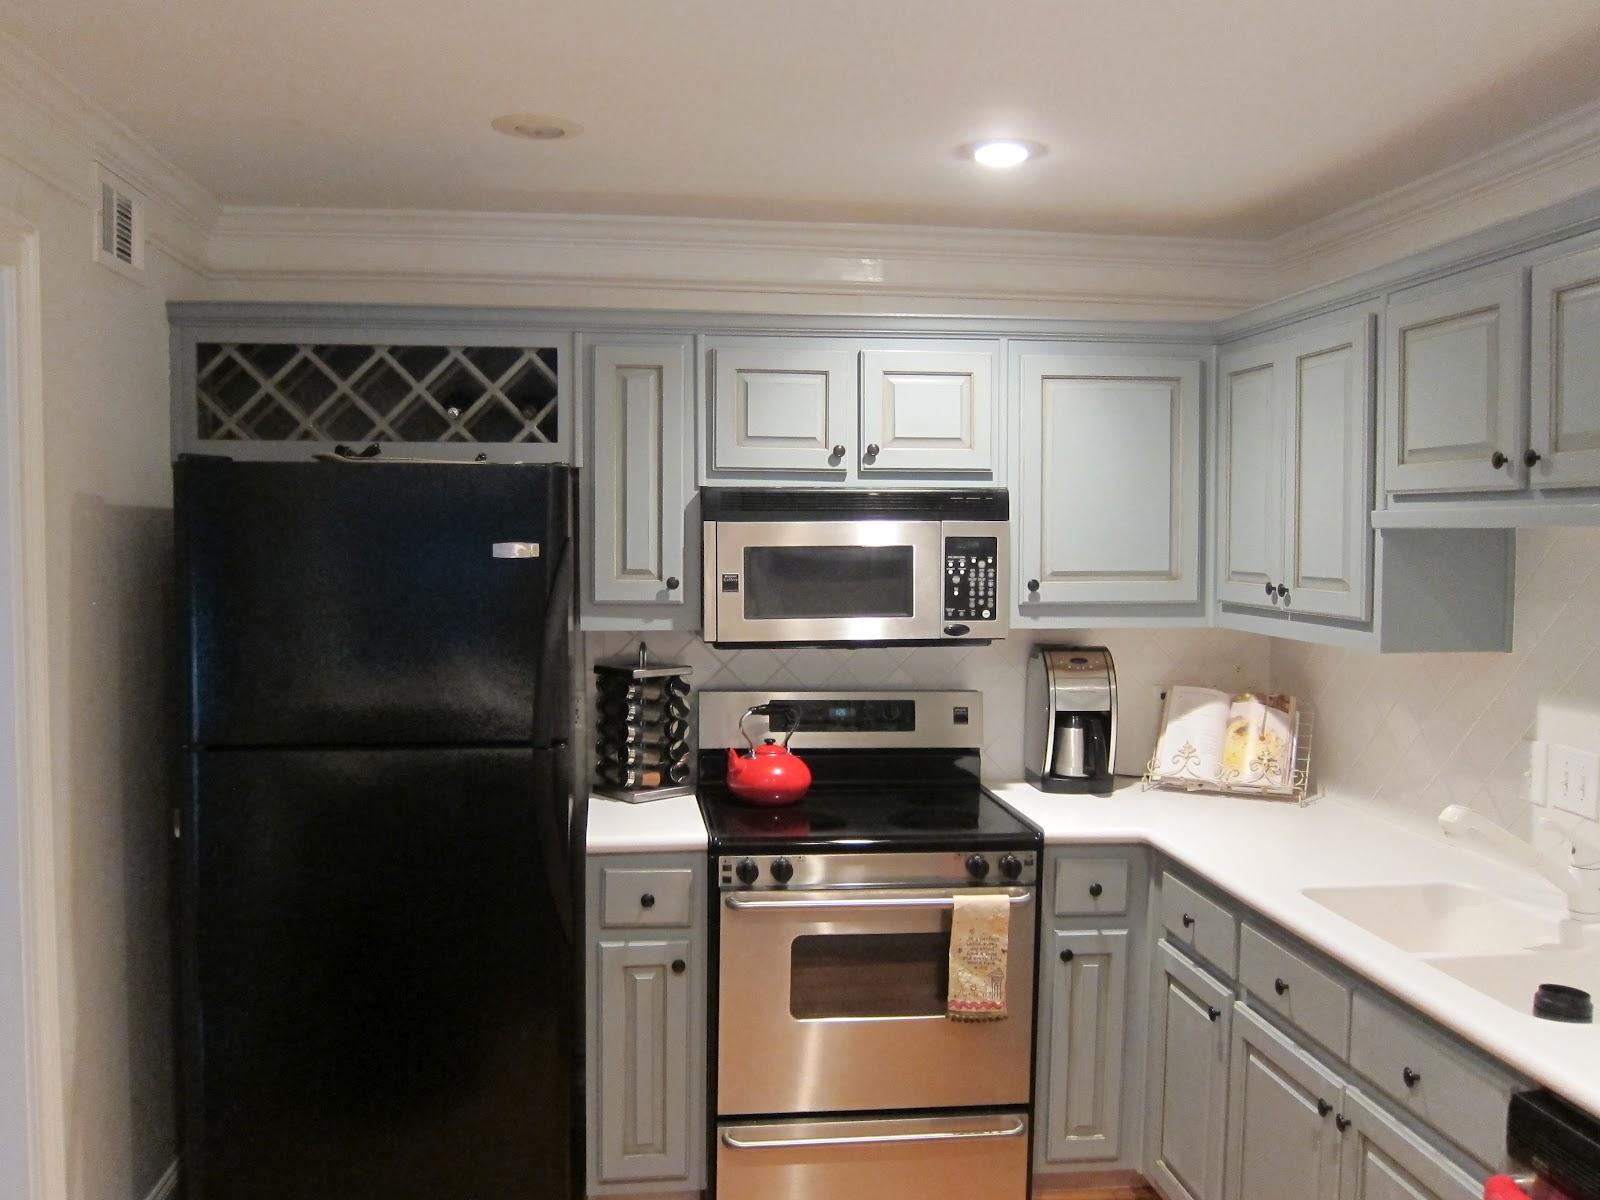 Furniture Rug Cabinet Paint Kitchen Kits